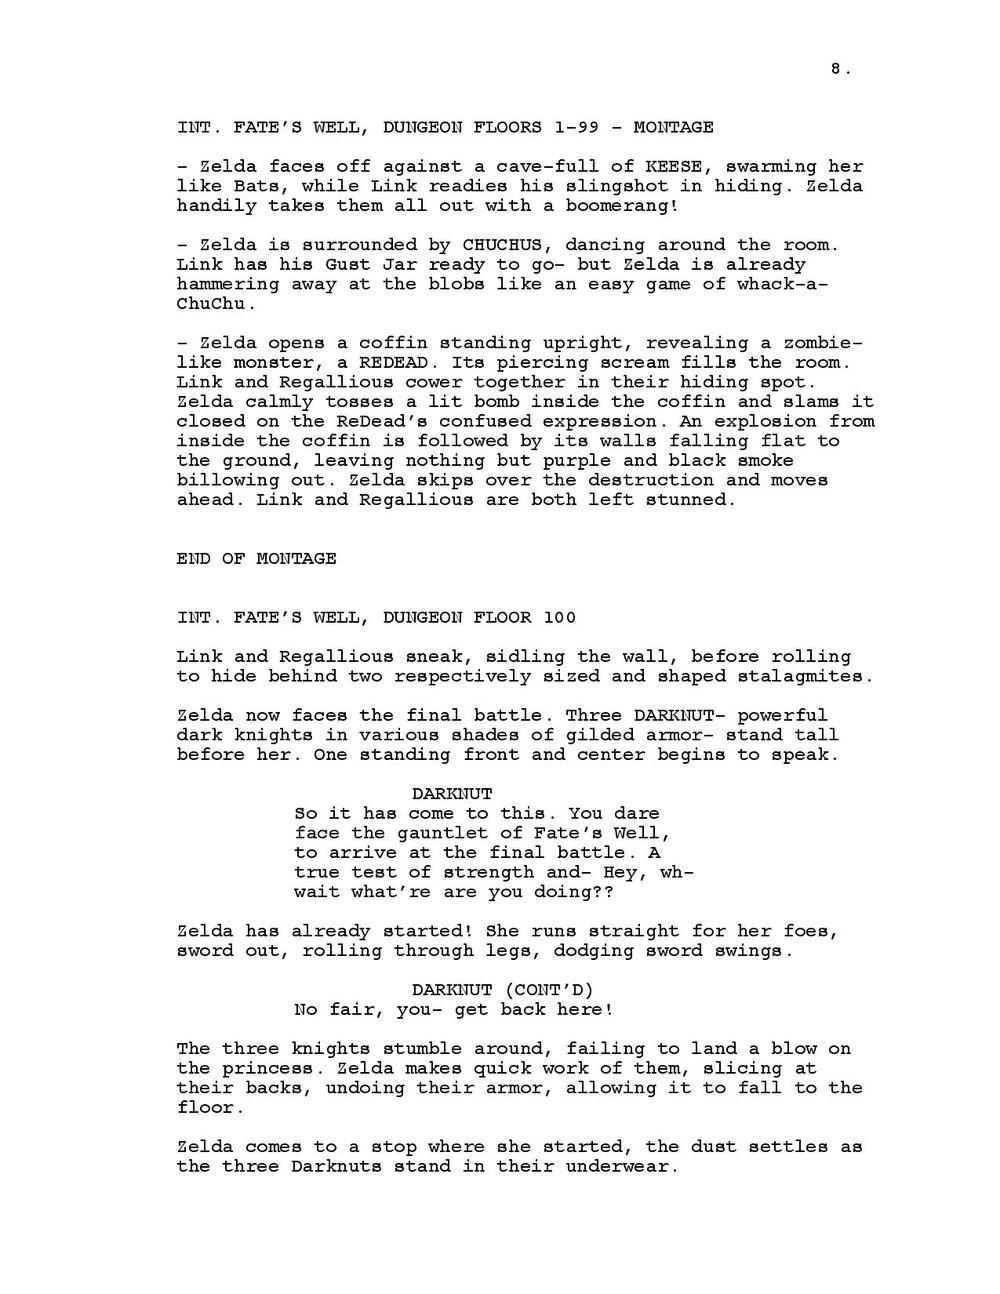 TheAdventuresofZelda&Link_Pilot-page-008.jpg